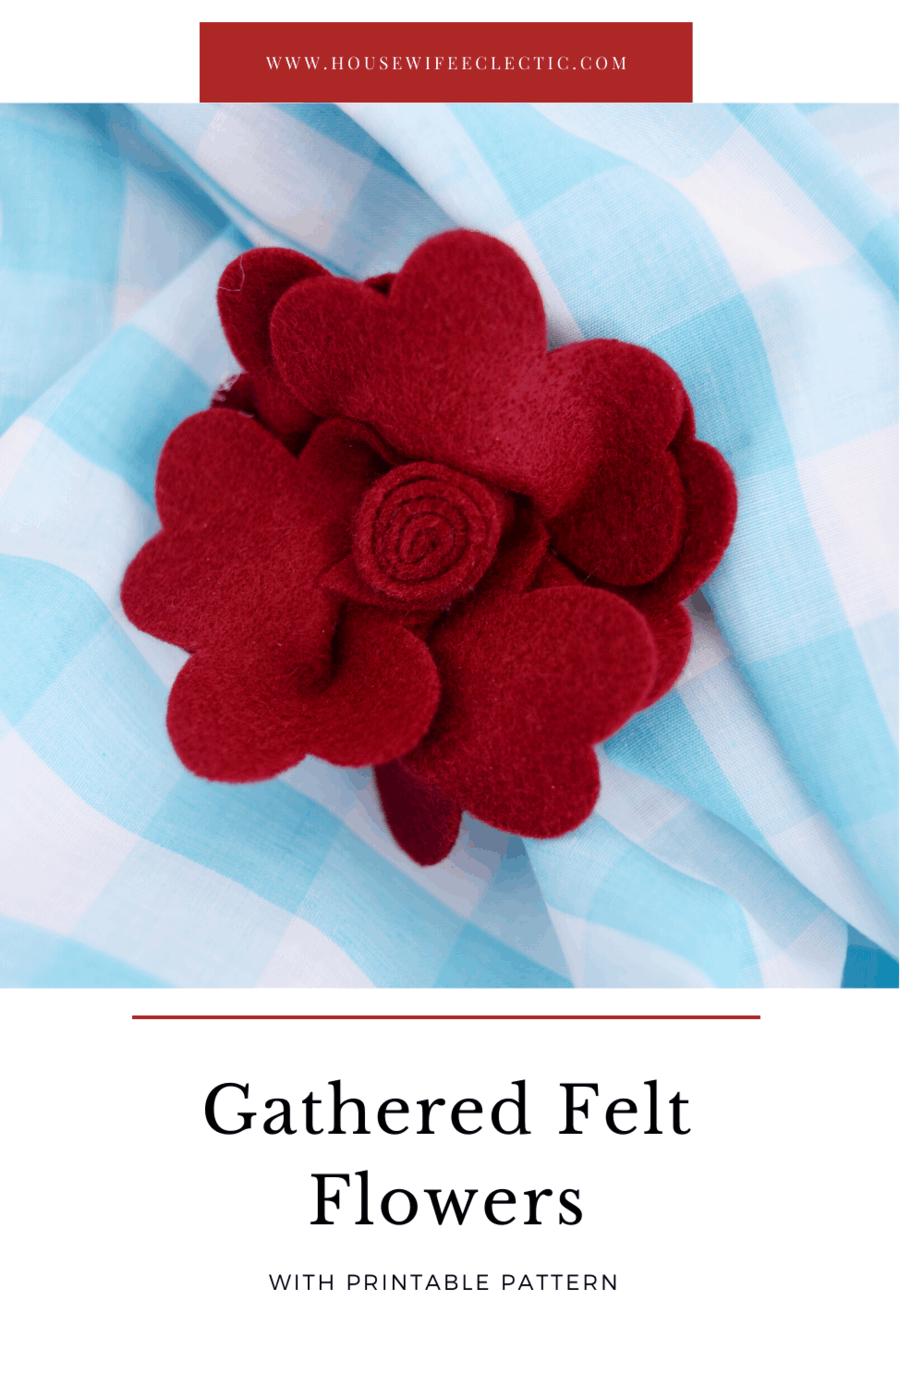 Gathered Felt Flowers